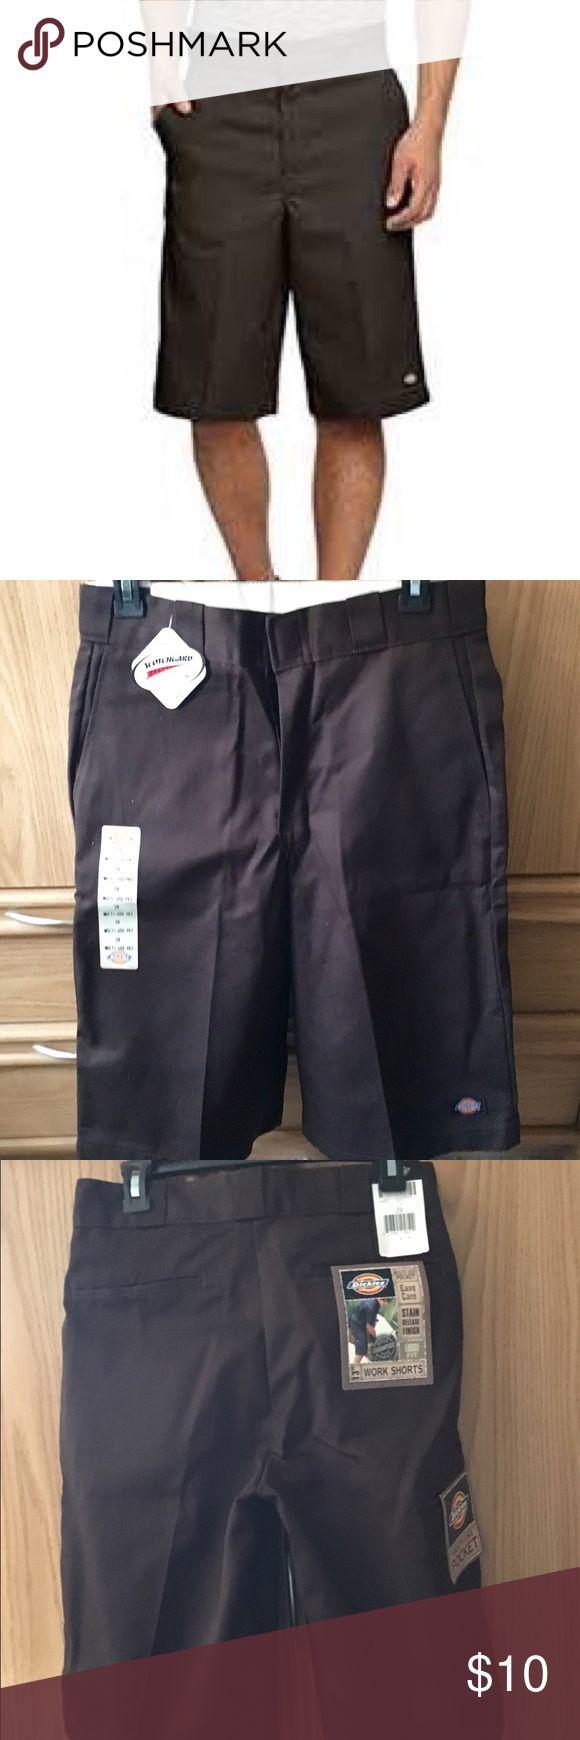 "Dickies Men's Work Shorts Men's Dickies dark brown 13"" multi-use pocket work shorts. Loose fit, flat front, permanent crease. Easy care Scotch Guard stain release finish. Size: 29. Dickies Shorts Flat Front"